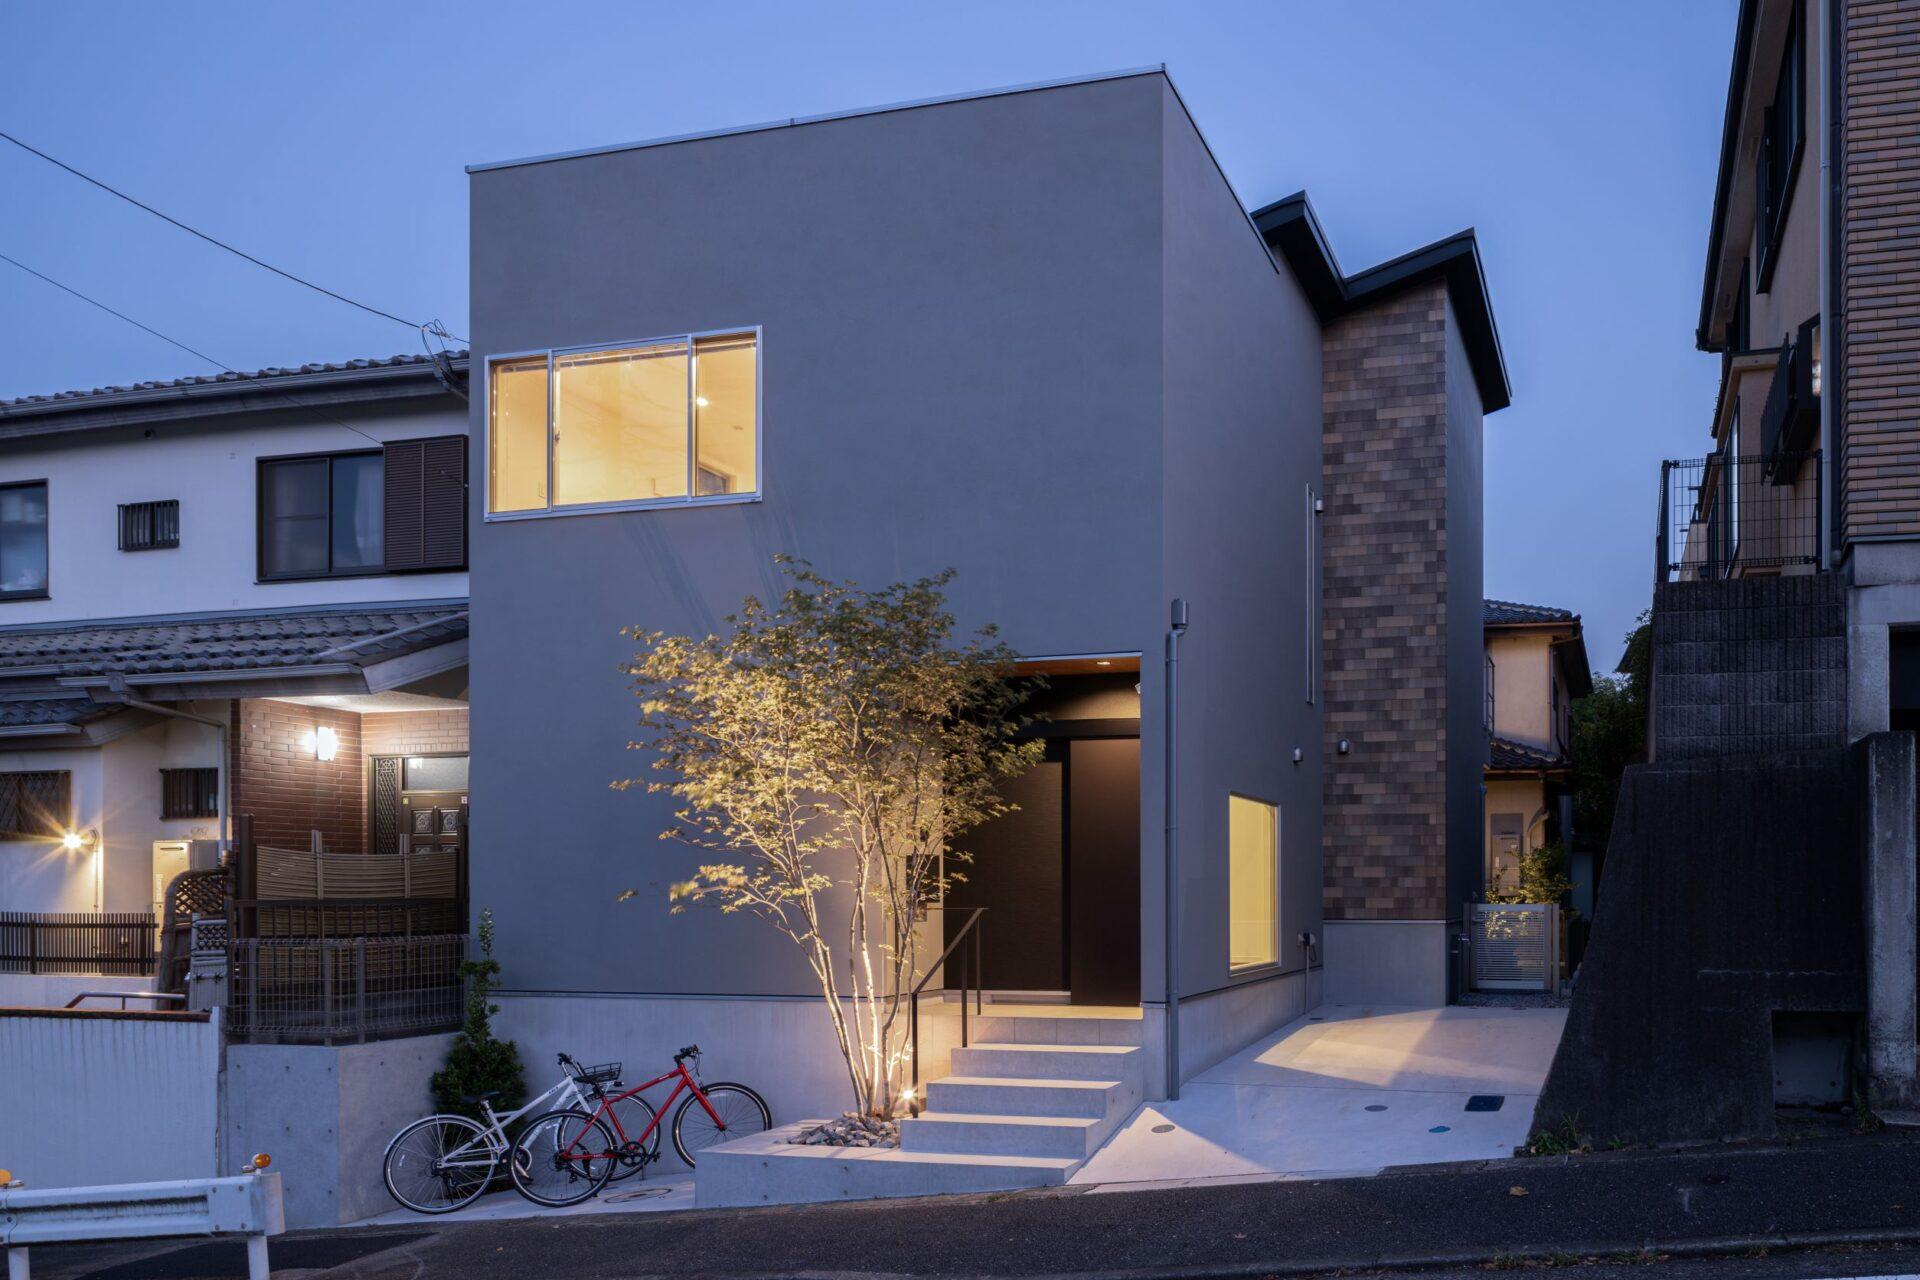 HITOMA design worksの施工事例港北の家